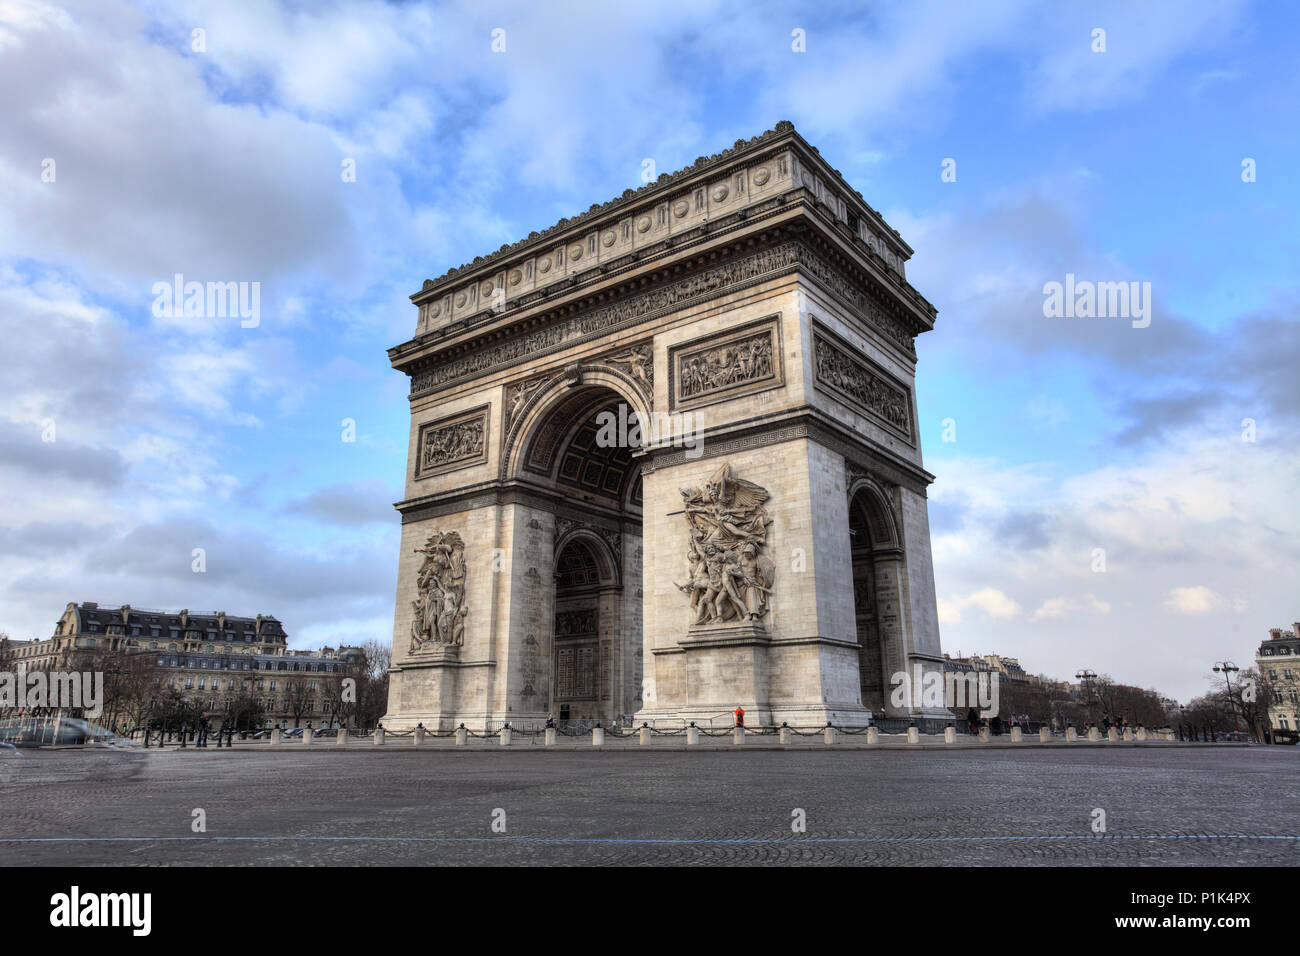 Arc de Triomphe against nice blue sky - Stock Image